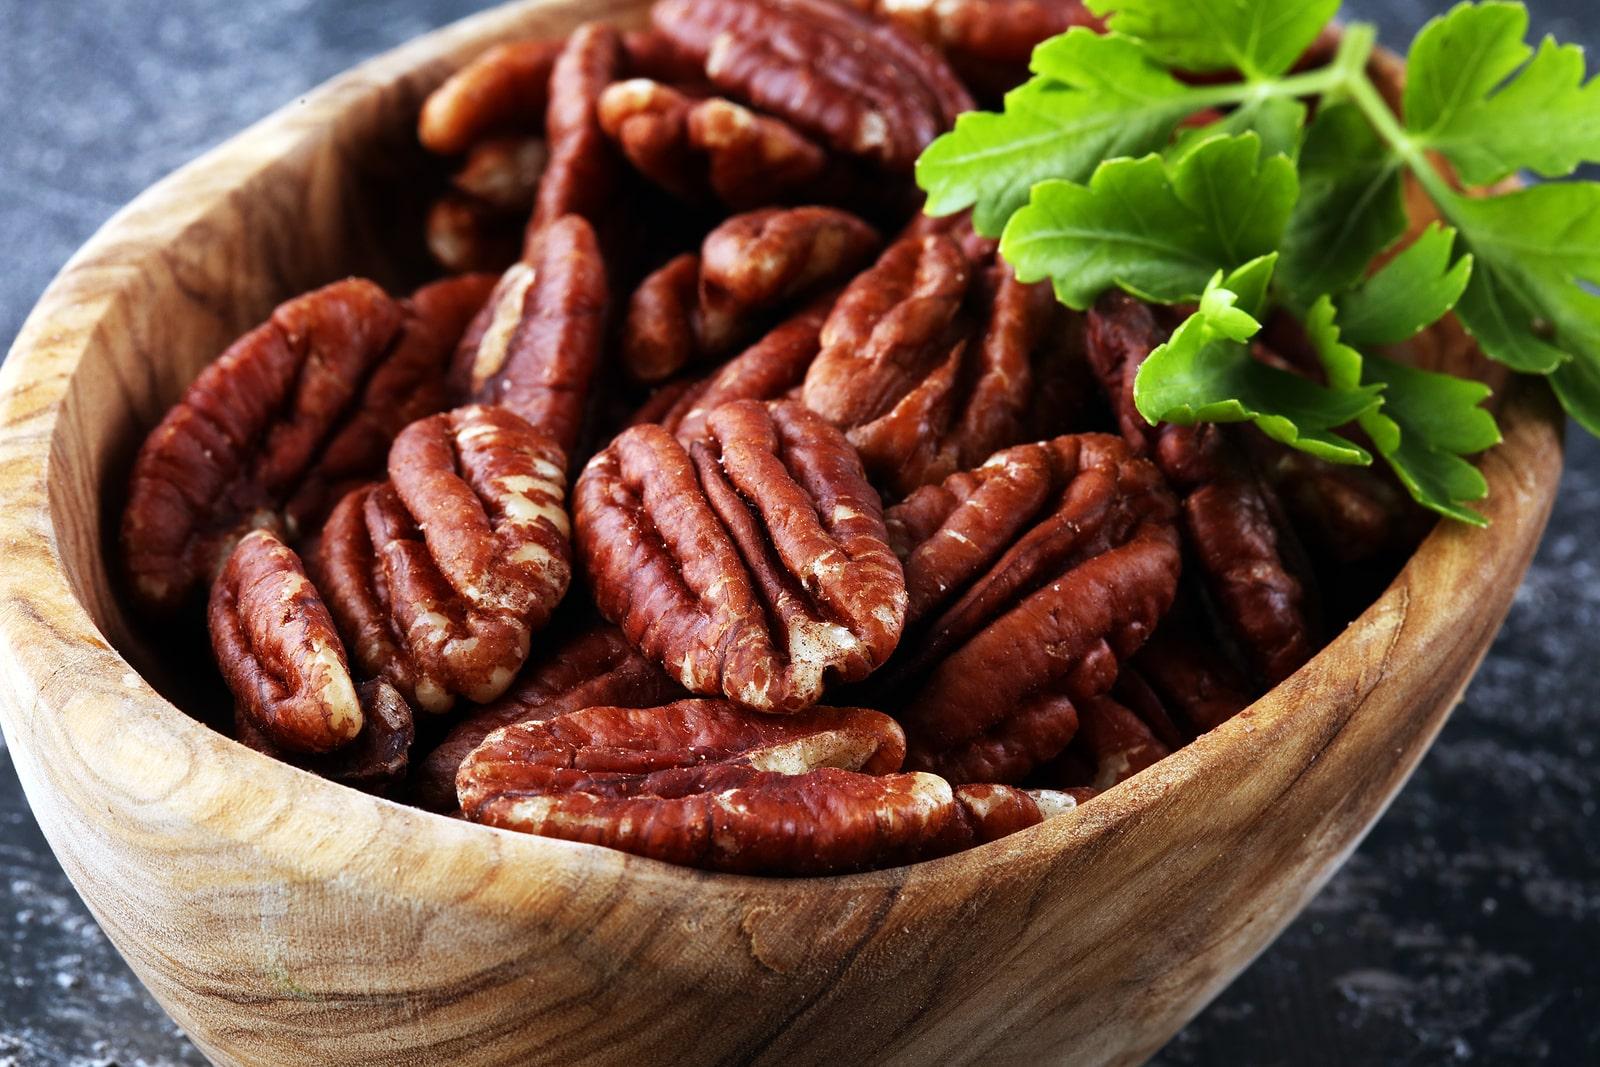 Pecan nuts